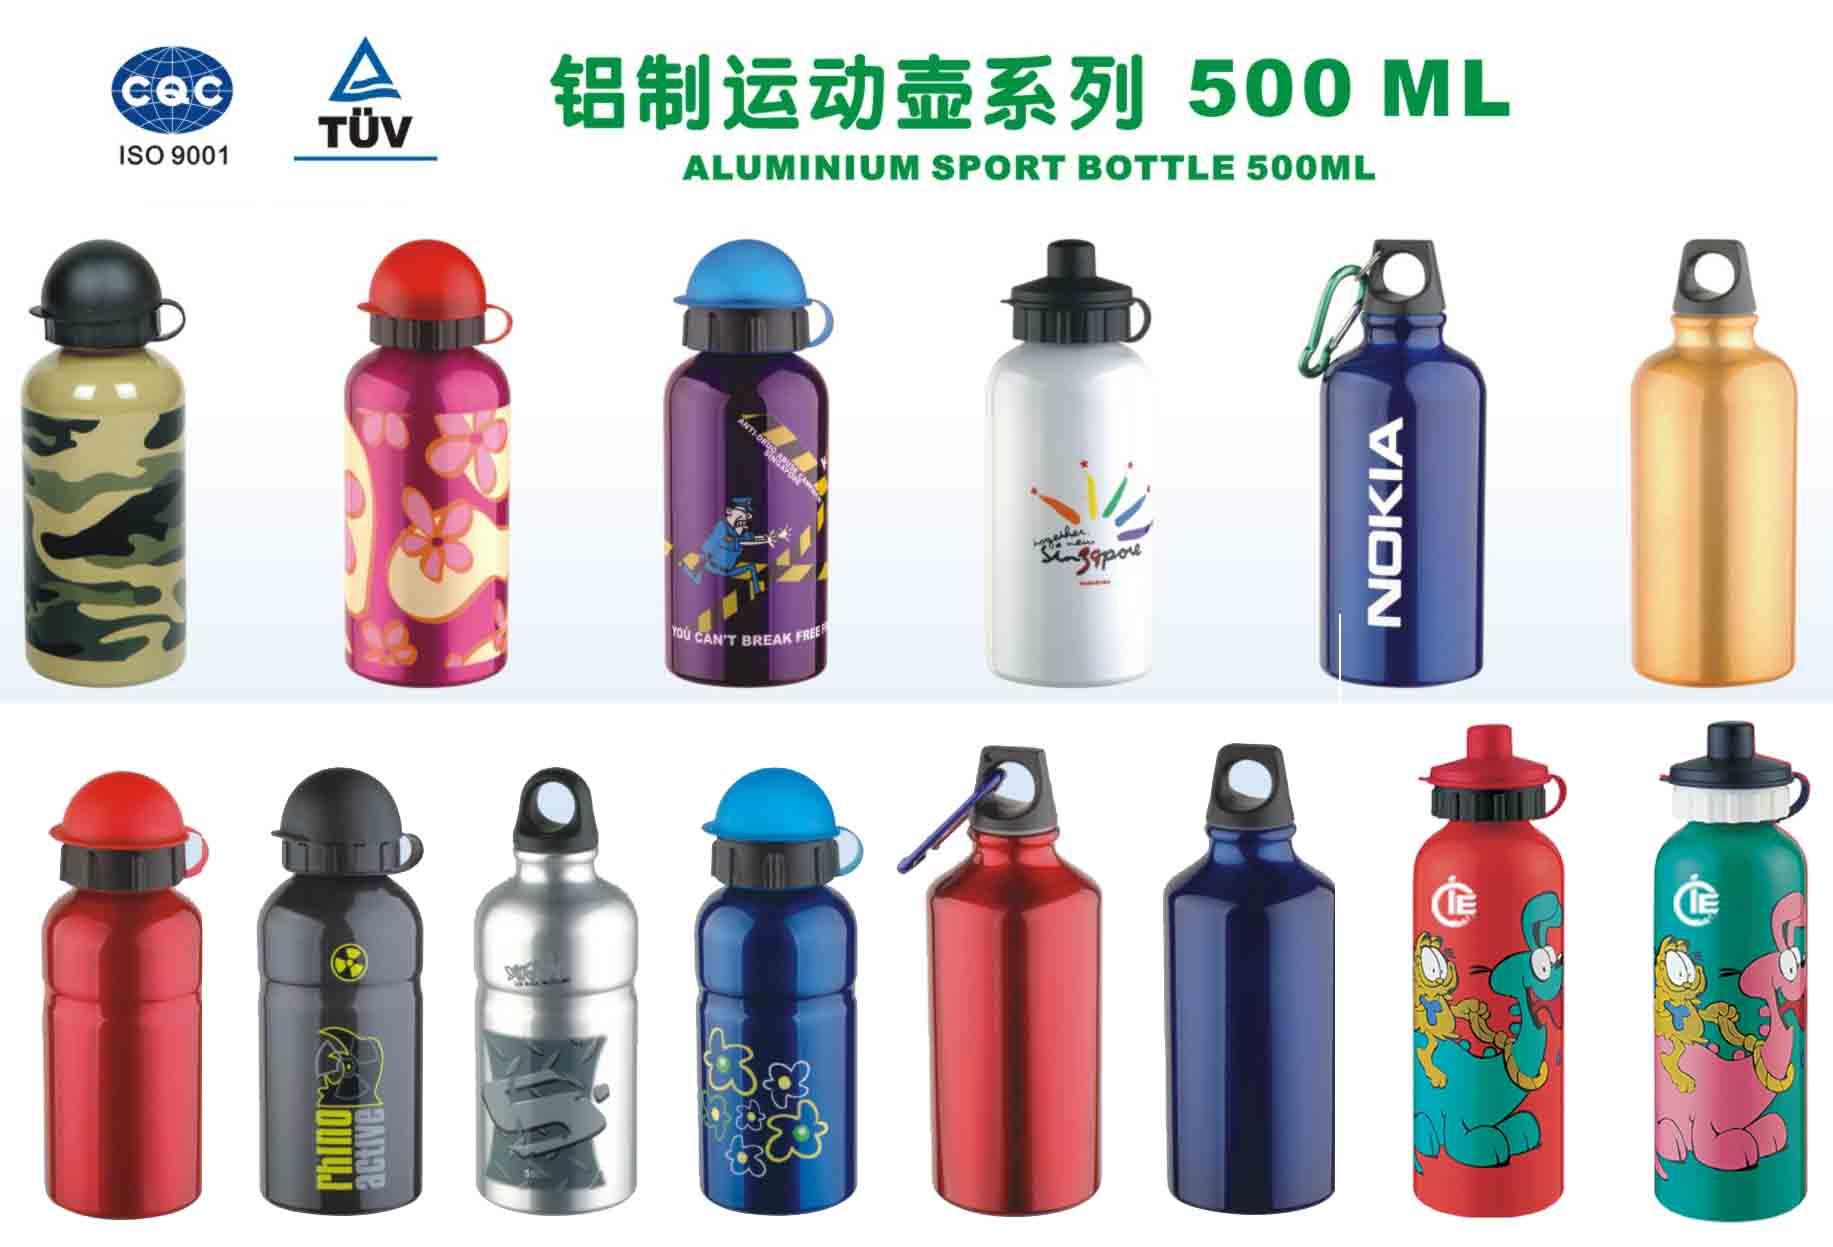 Aluminum Bottle 500ml (Алюминиевая бутылка 500мл)